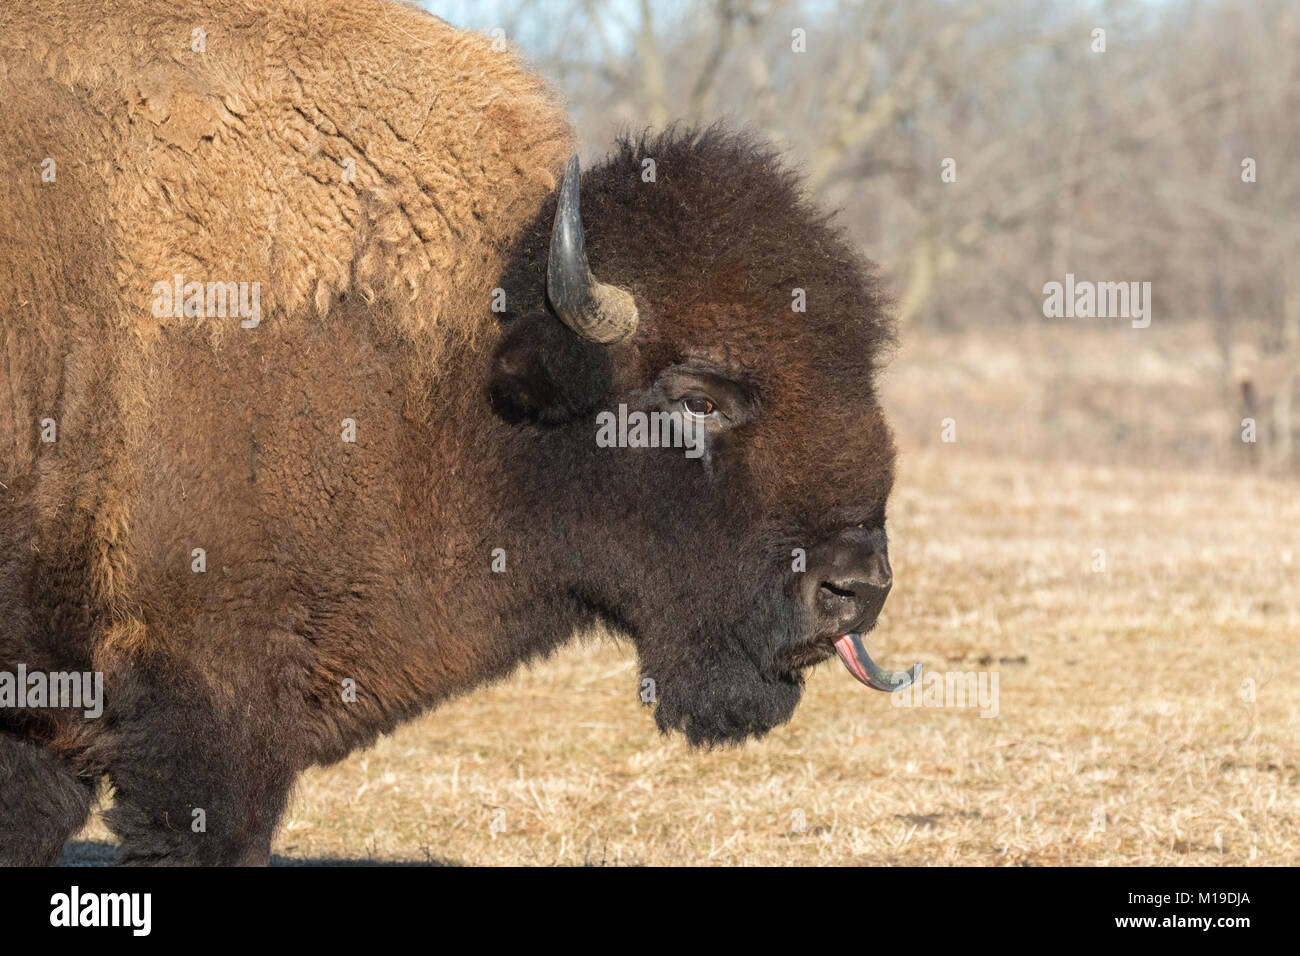 Le bison d'Amérique (Bison bison) à Neal Smith Wildlife Refuge Photo Stock